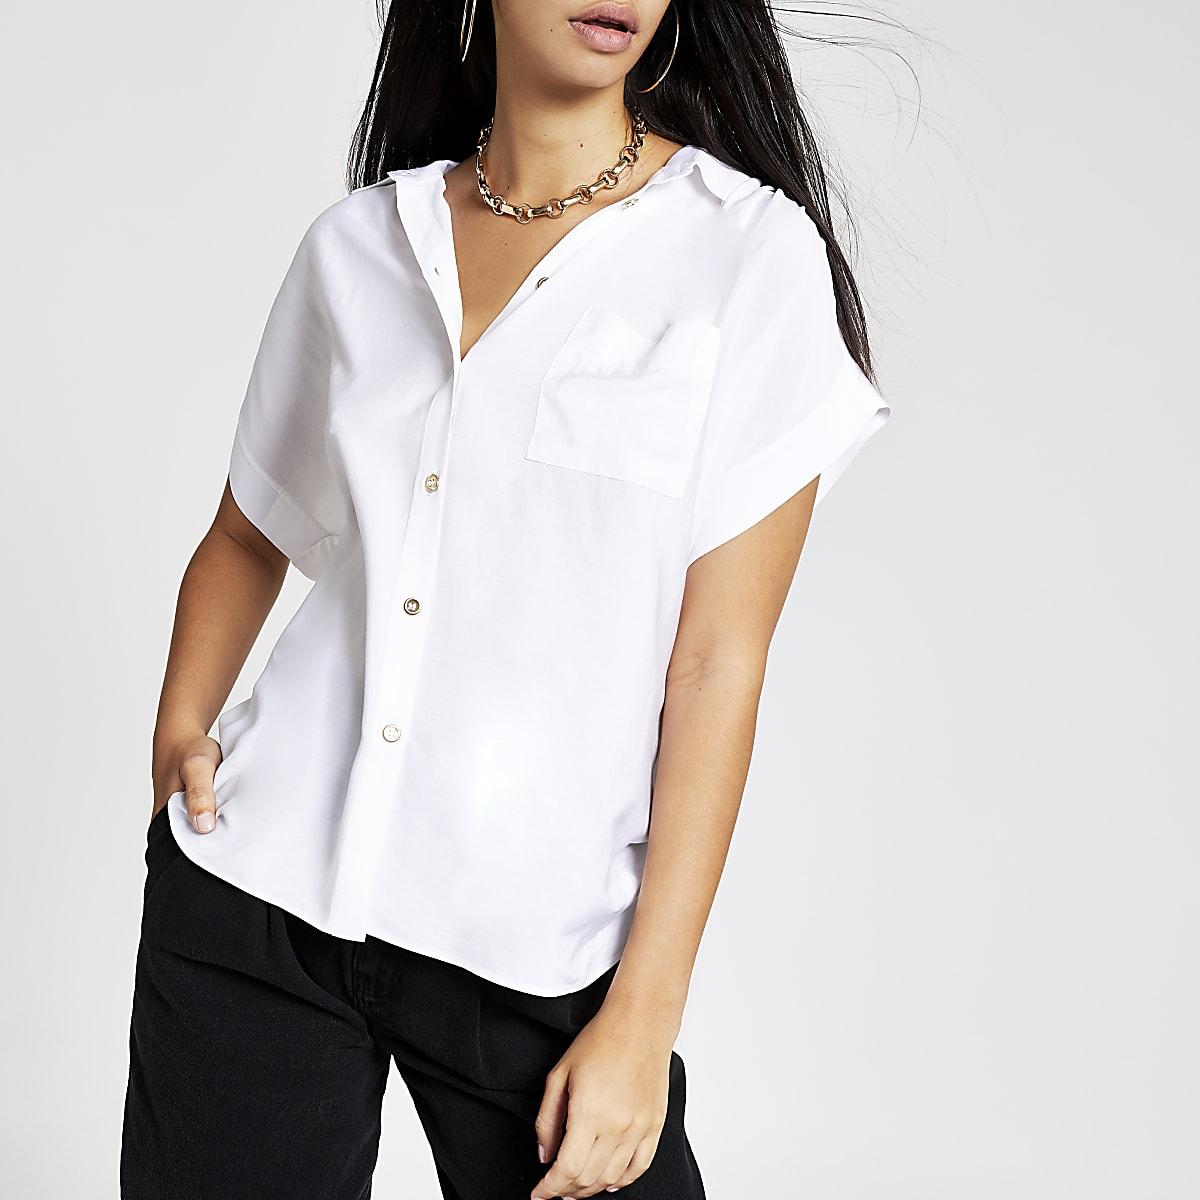 White short sleeve shirt